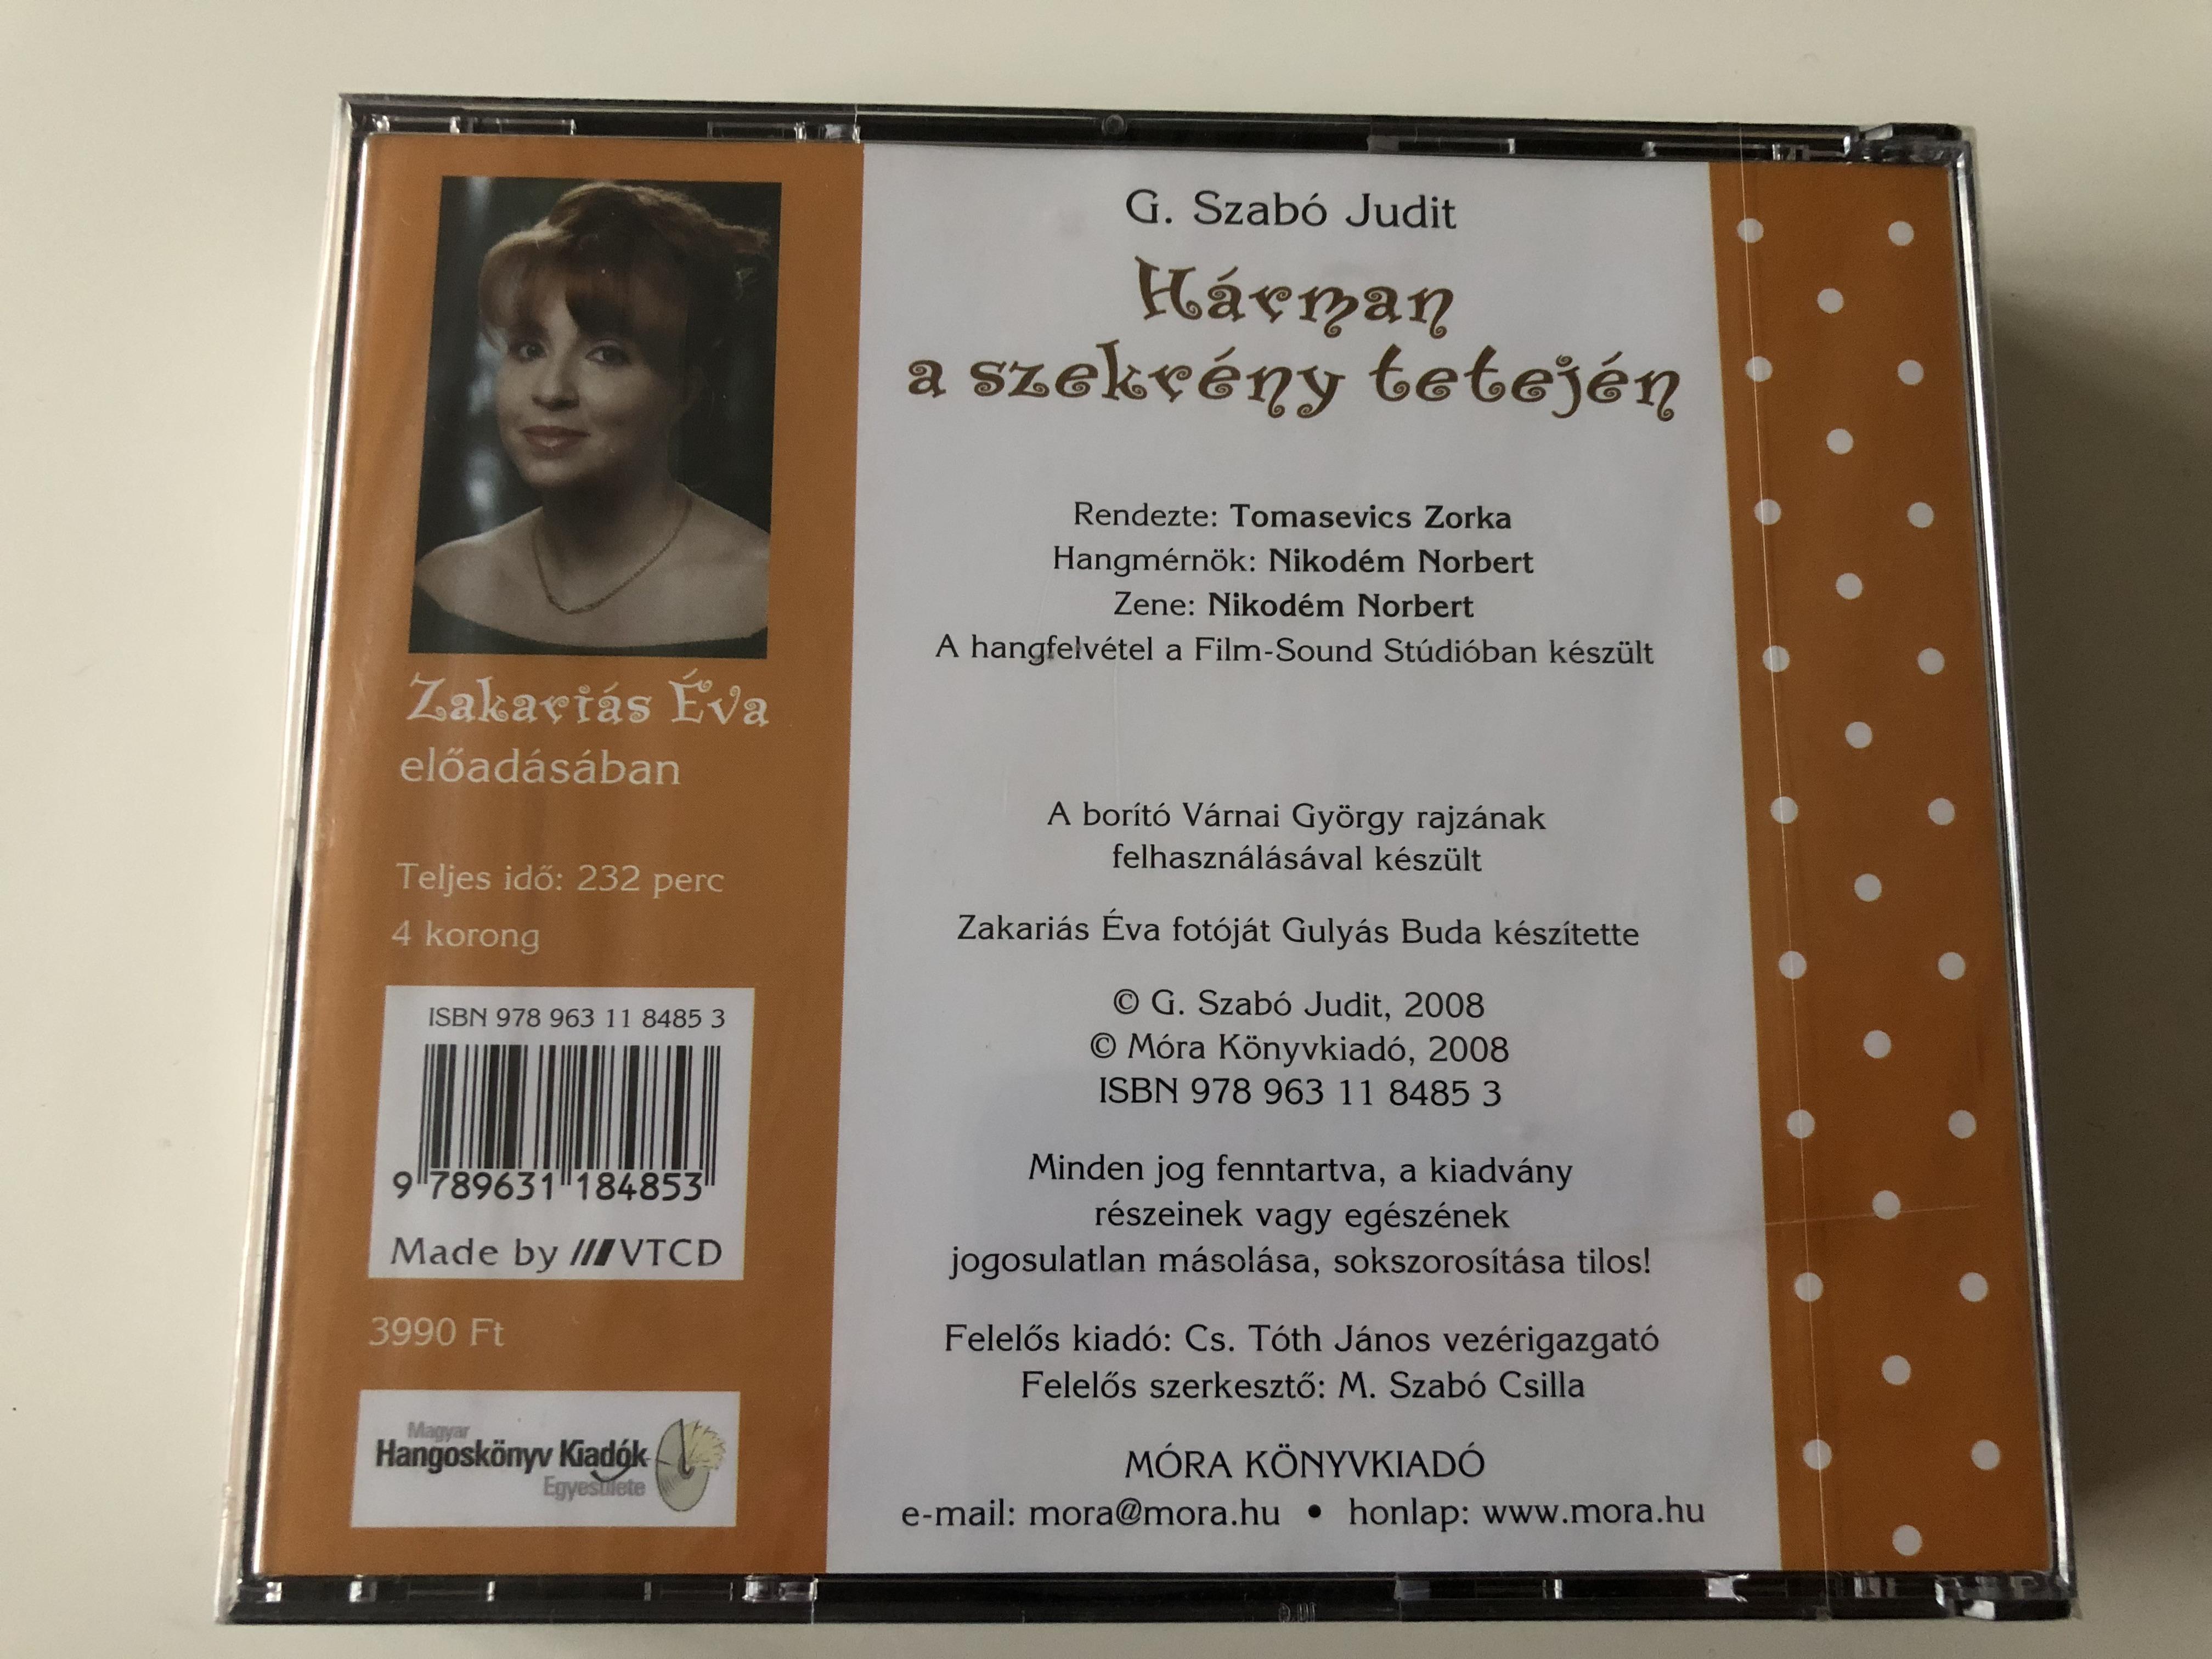 h-rman-a-szekr-ny-tetej-n-by-g.-szab-judit-hungarian-language-audio-book-read-by-zakari-s-va-4x-audio-cd-set-m-ra-k-nyvkiad-2008-3-.jpg